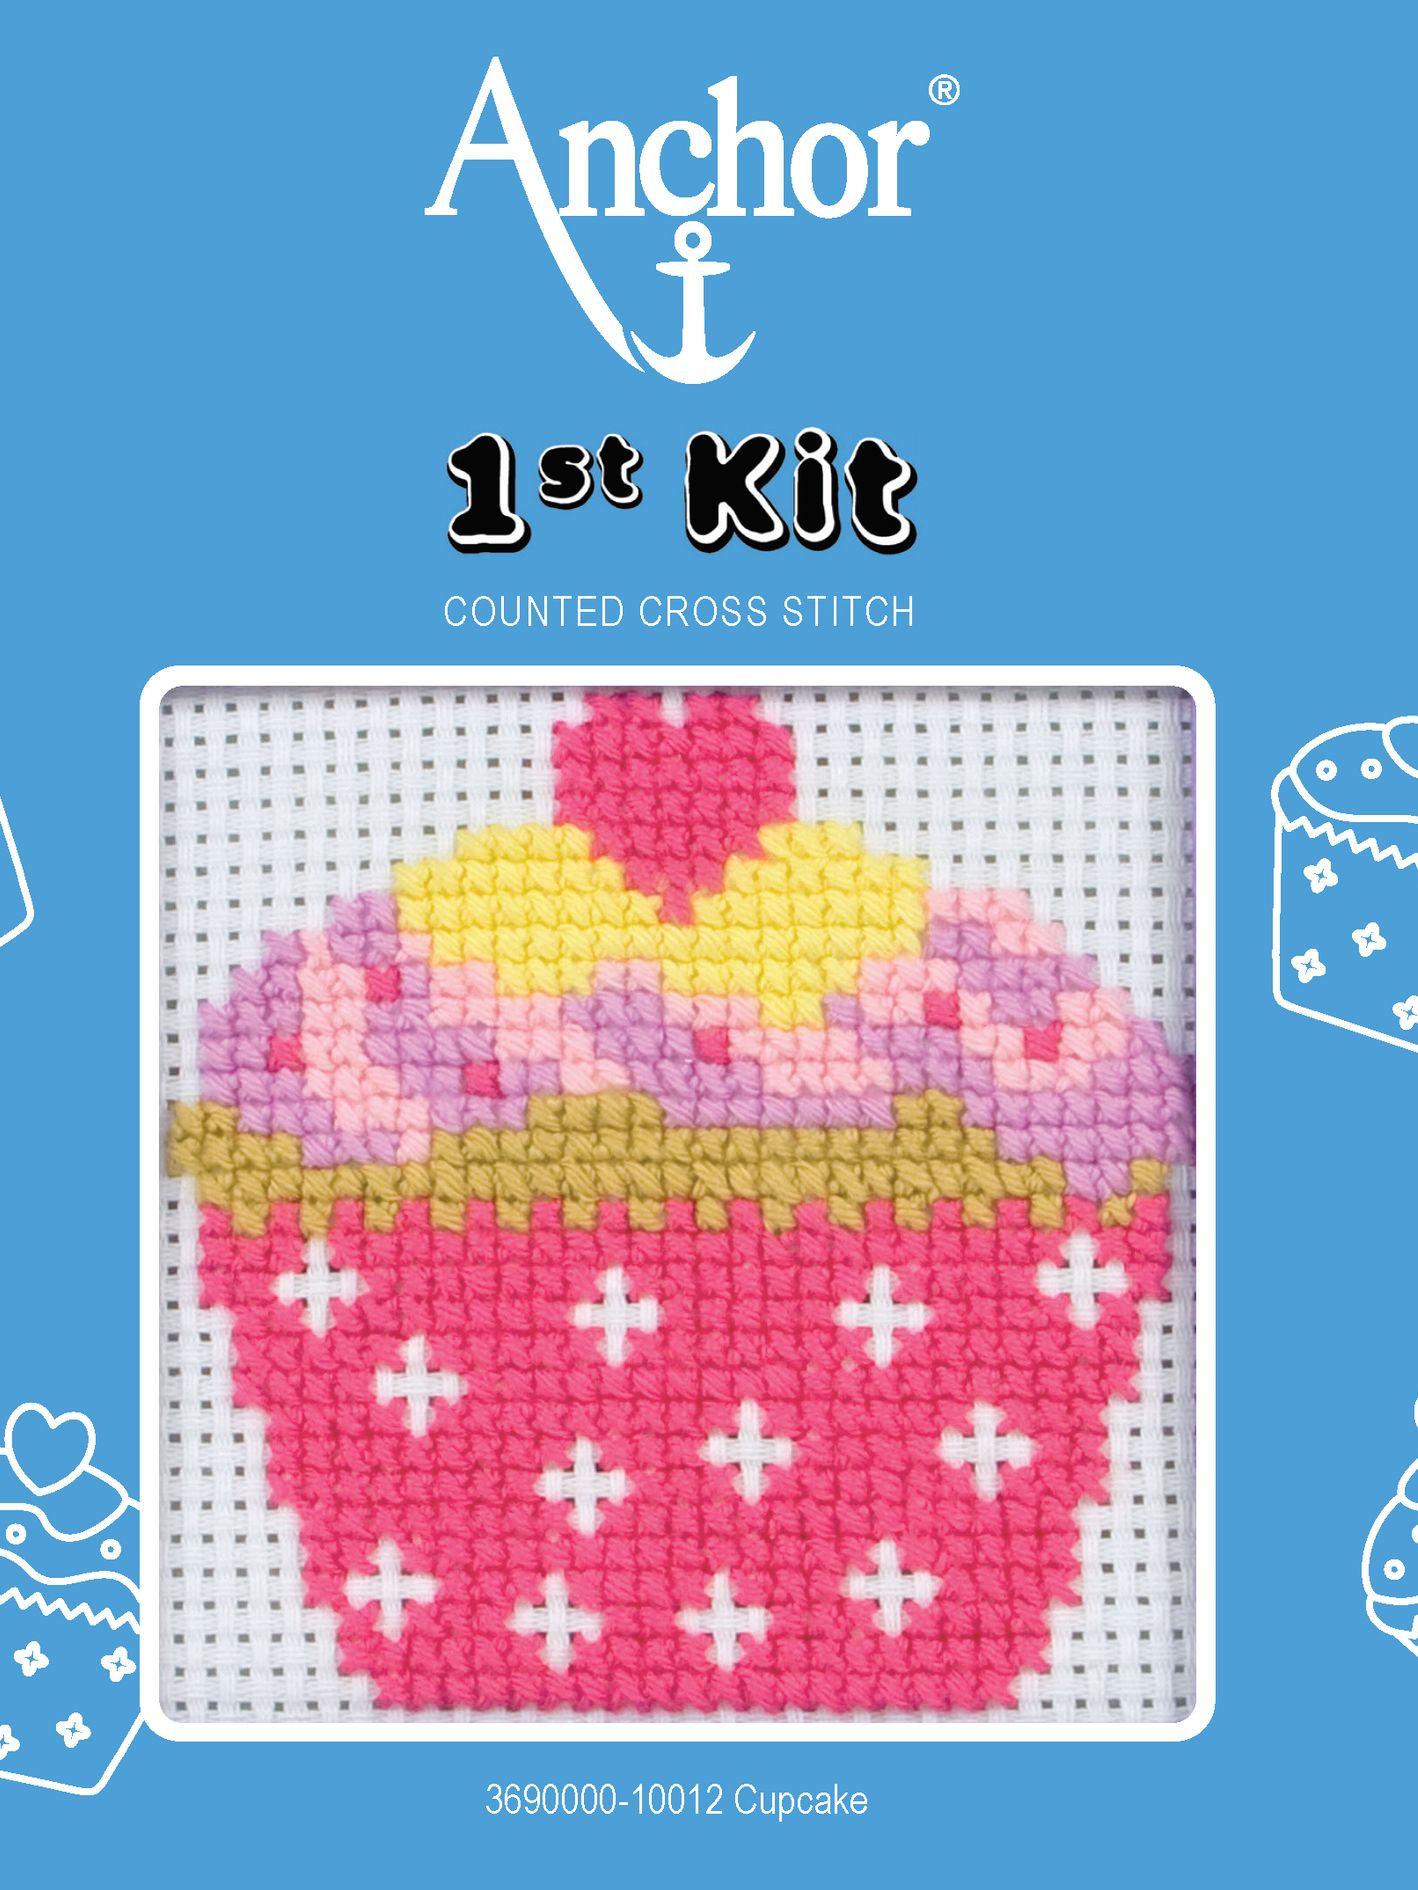 Anchor Anchor Cupcake Starter Cross Stitch Kit